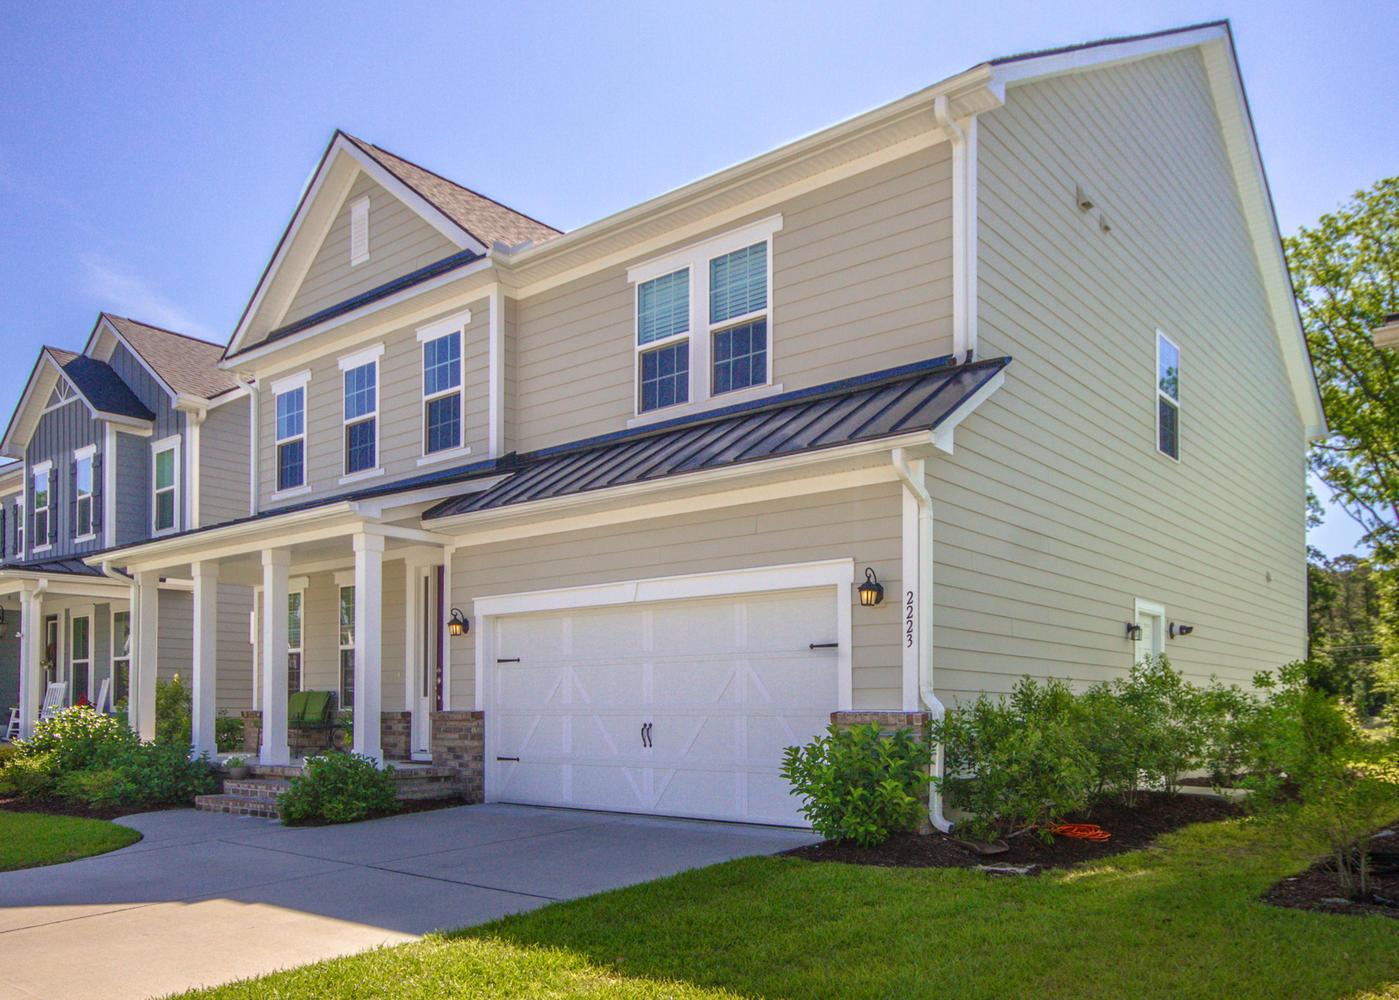 Magnolia Village Homes For Sale - 2223 Spring Hope, Mount Pleasant, SC - 11